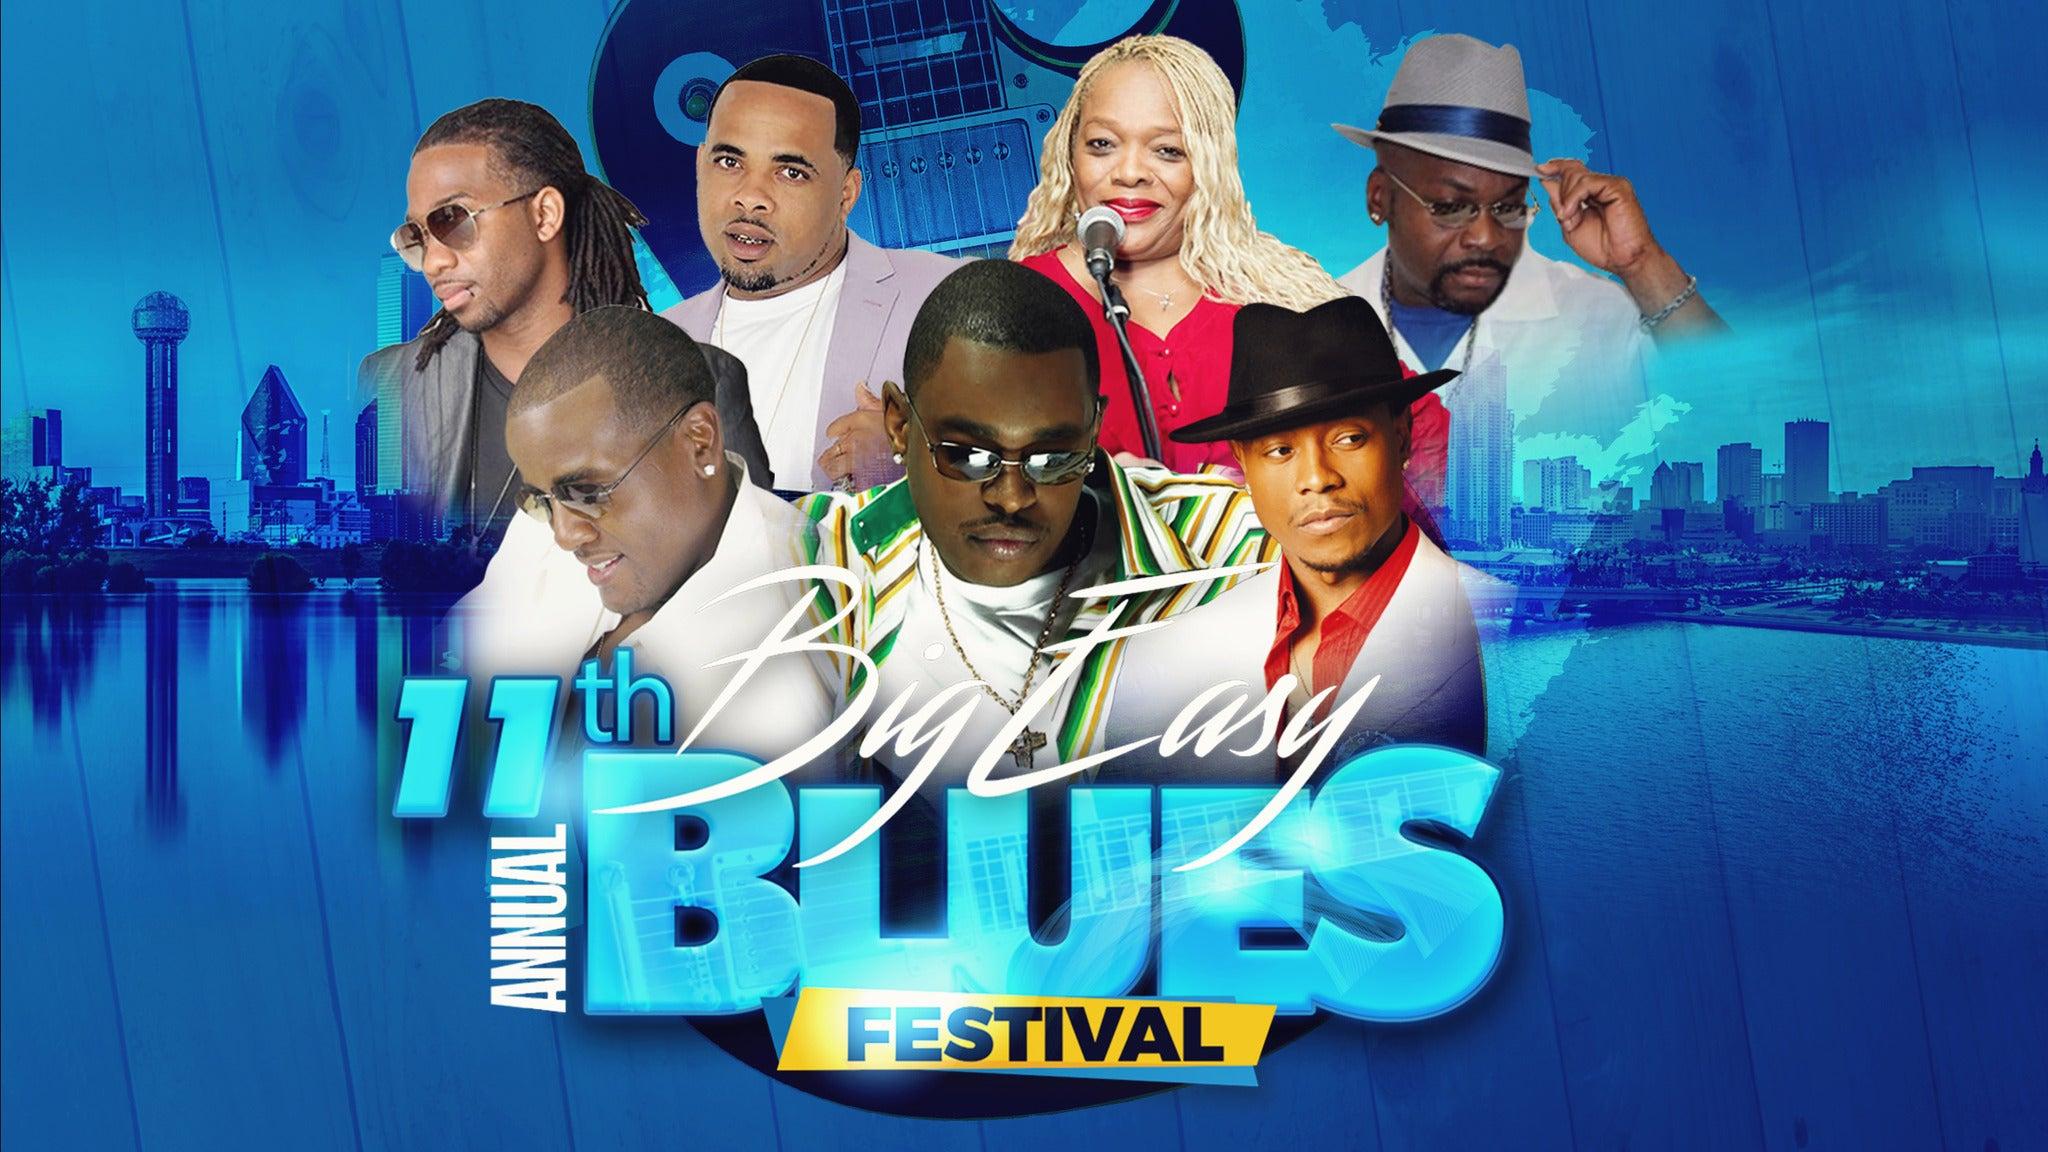 11th Annual Big Easy Blues Festival at UNO Lakefront Arena